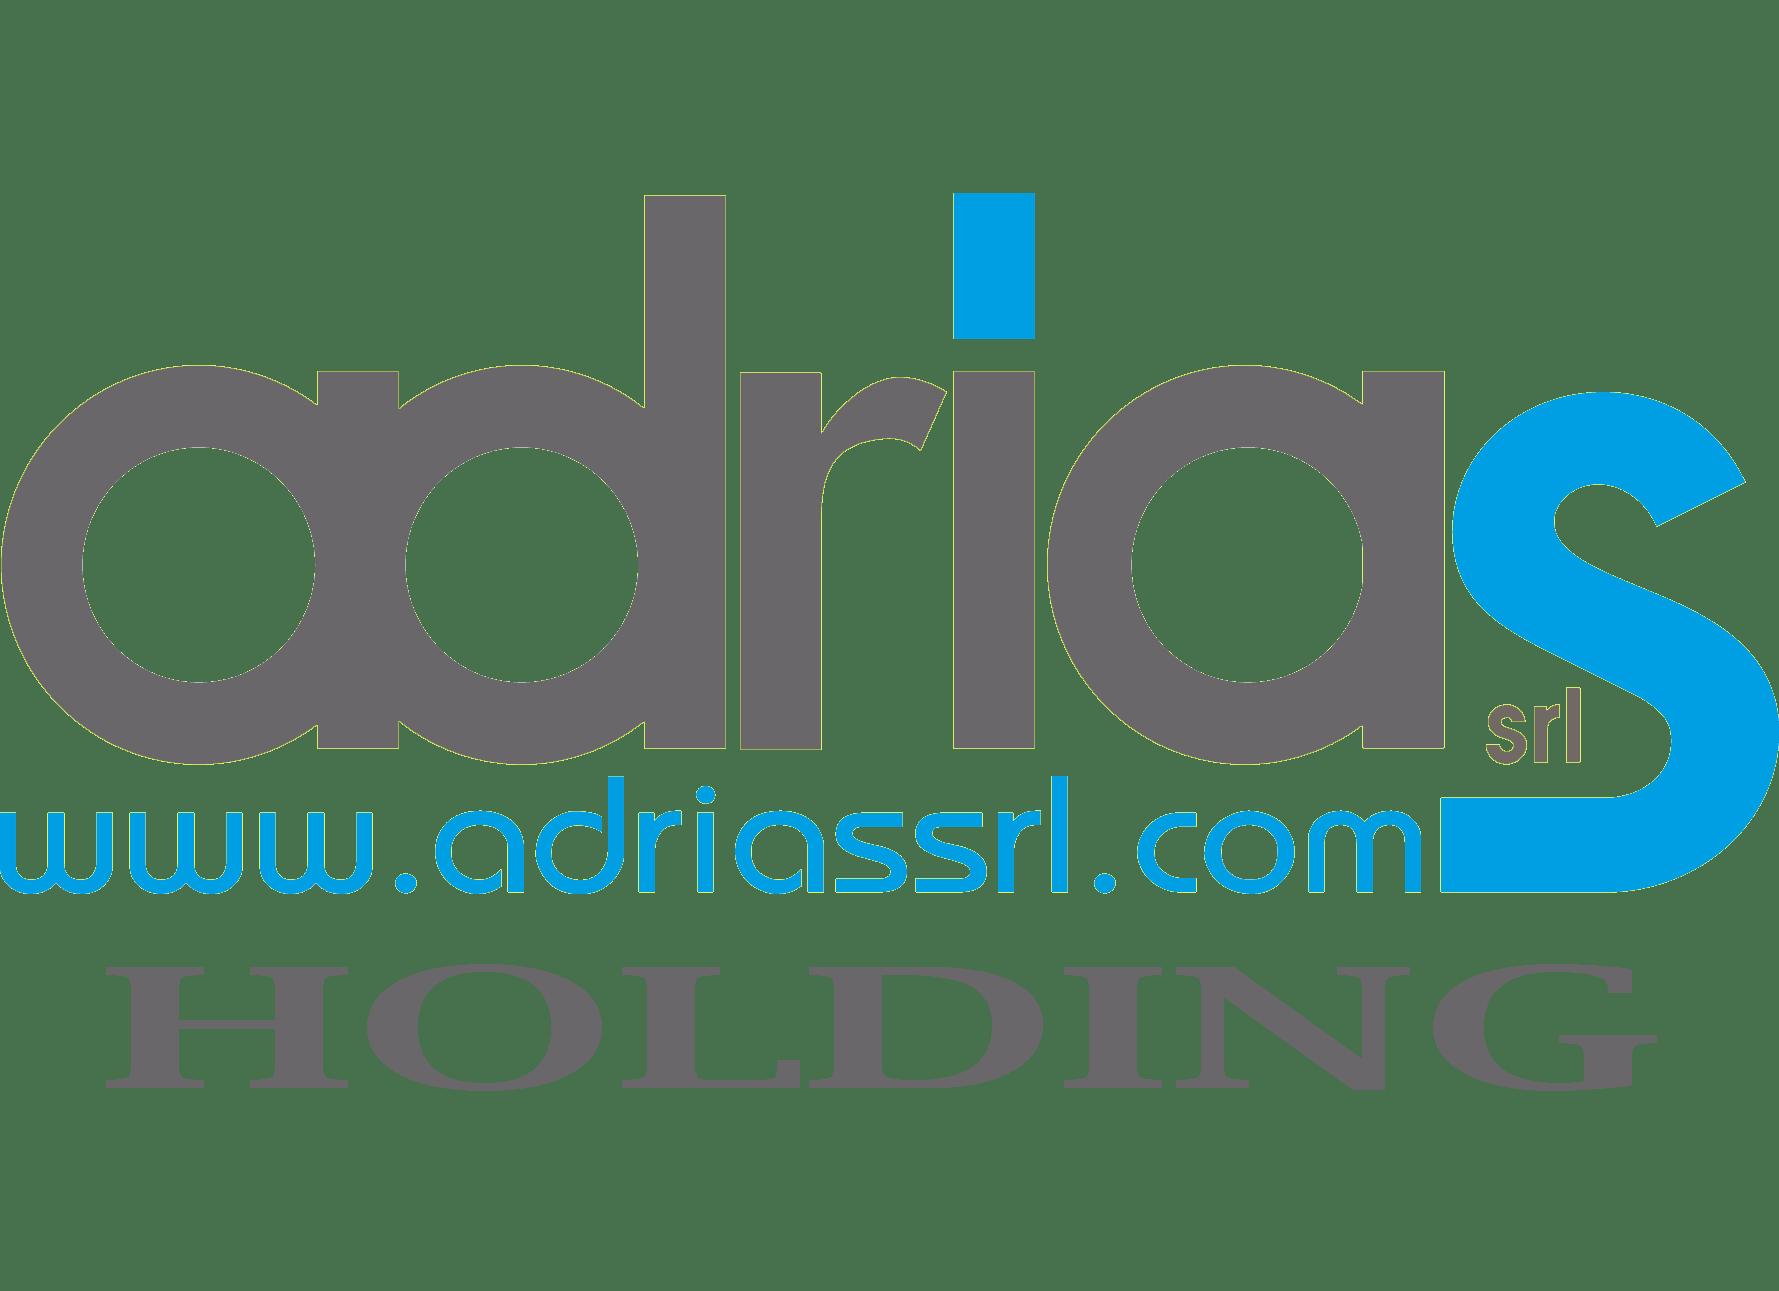 Adrias S.r.l Logo